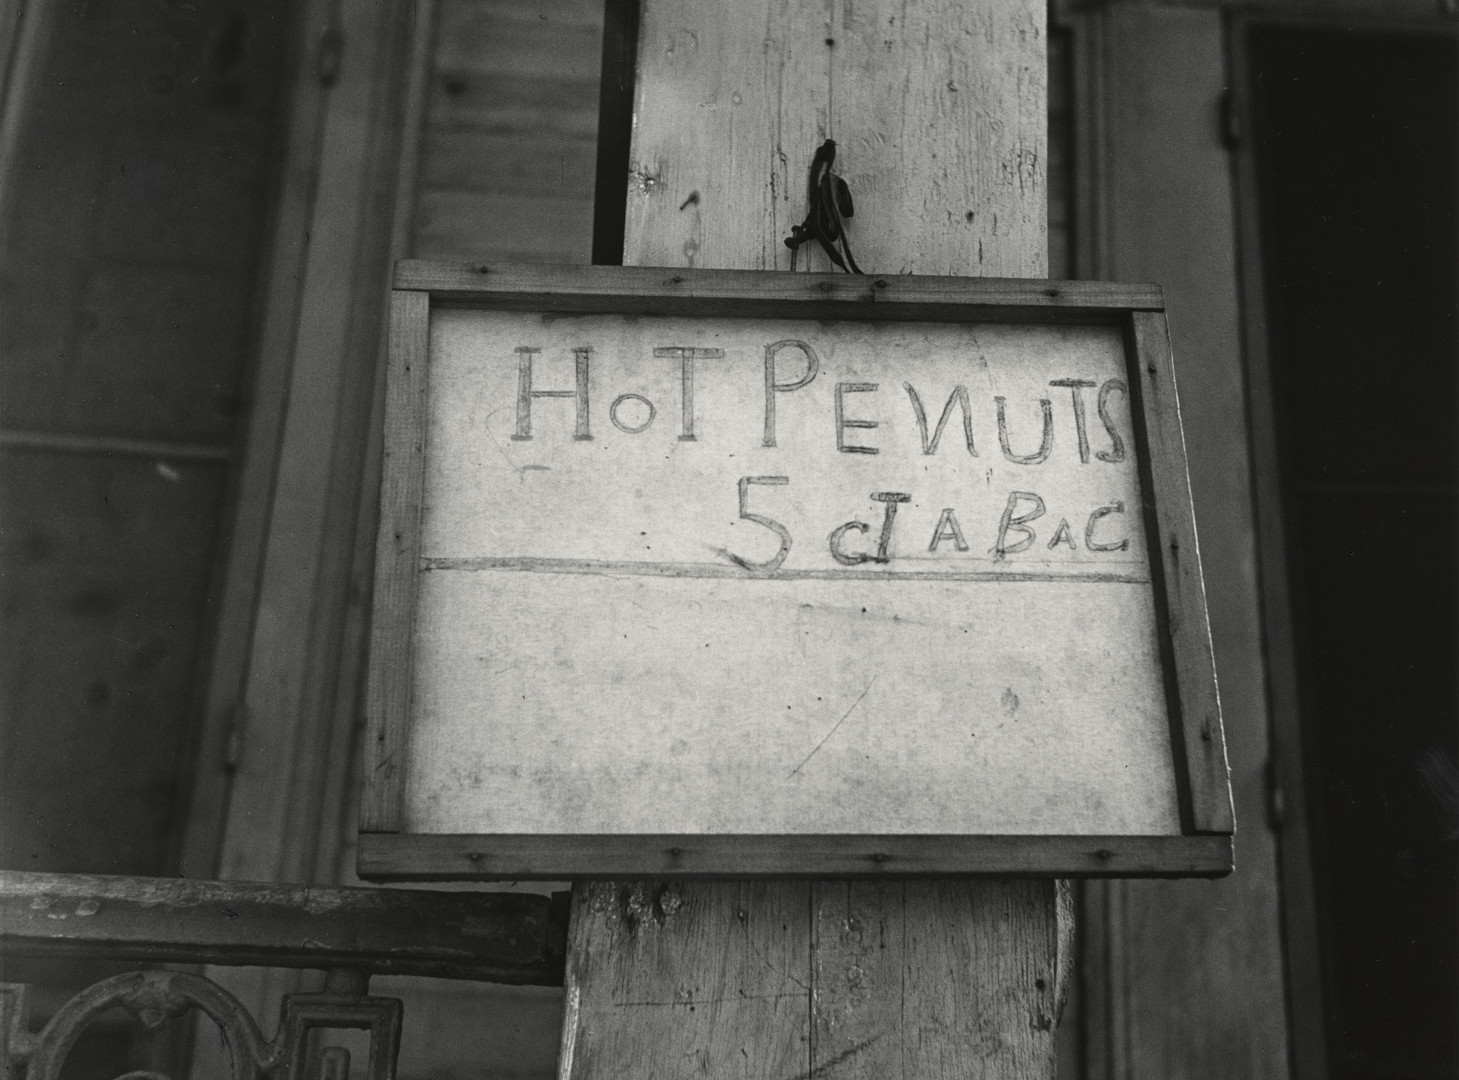 Irving Penn, (Wall Sign) Hot Penuts, American South, 1941